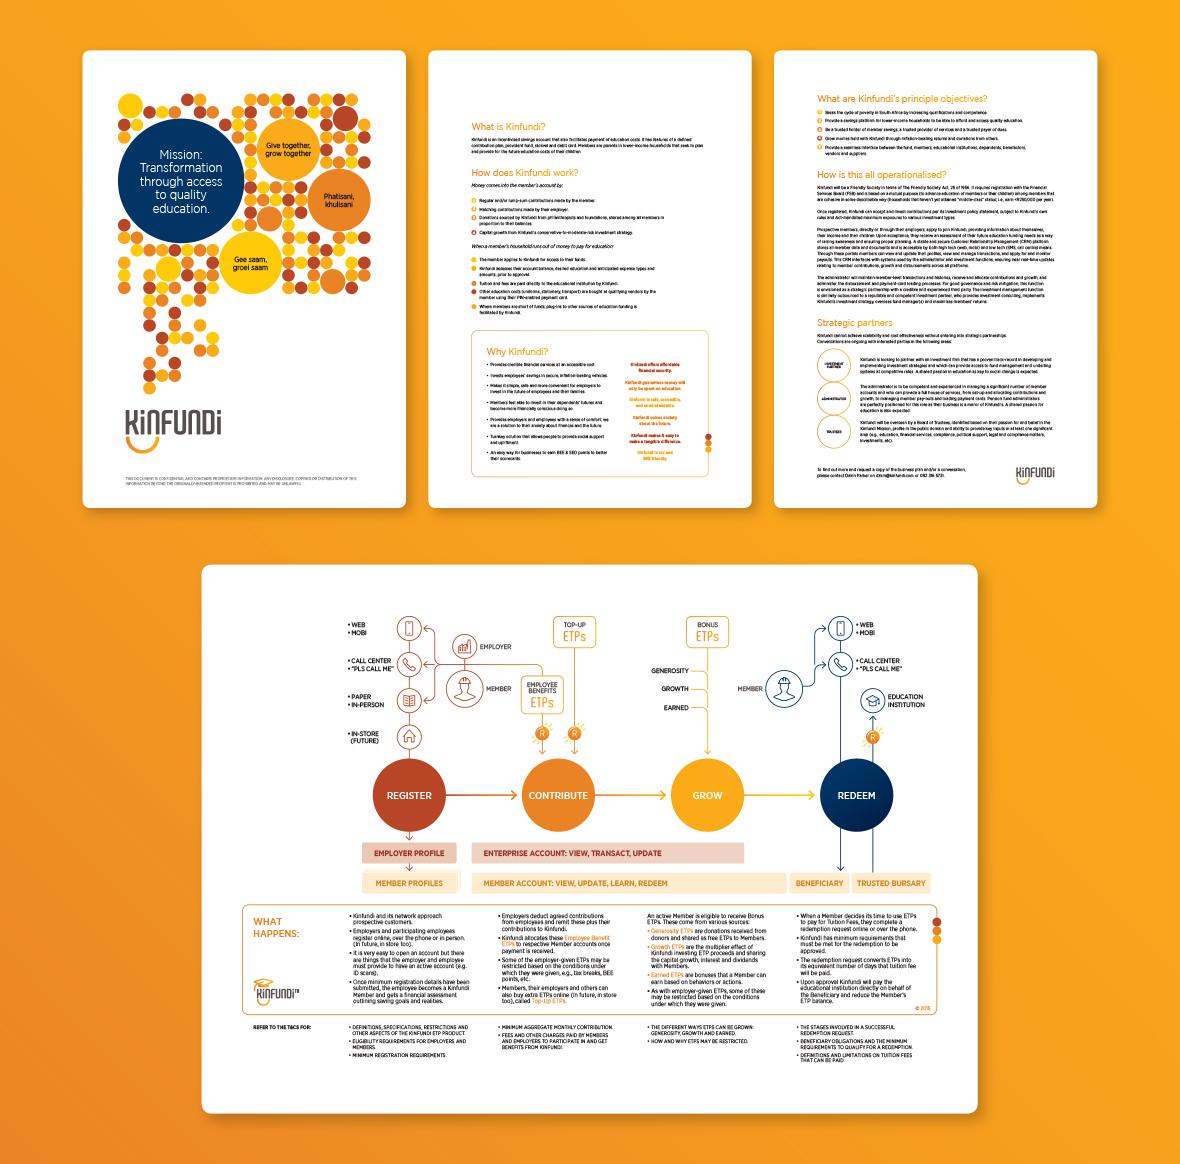 Kinfundi Business Documents